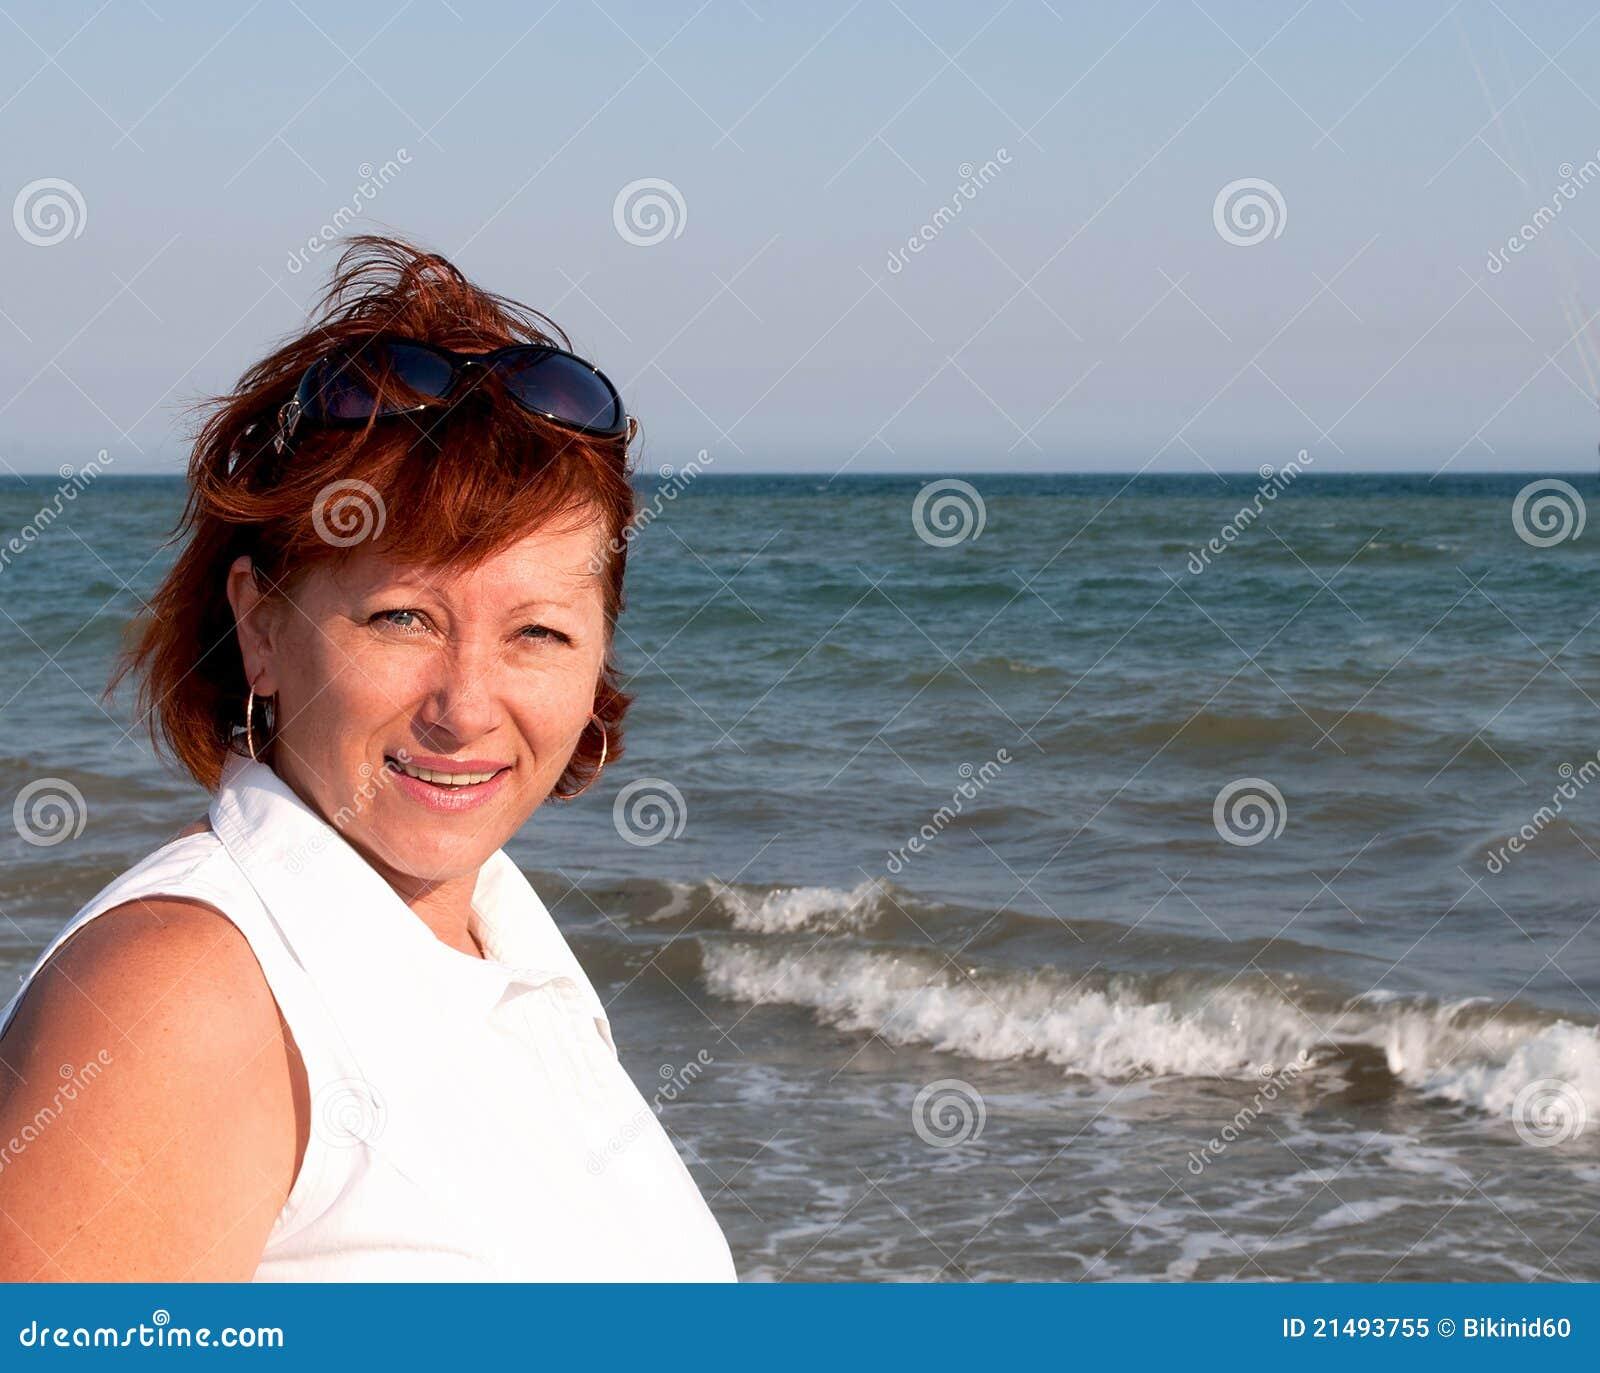 Happy Beautiful Woman Enjoying At Beach Stock Photo: Mature Woman. Stock Image. Image Of Sand, Outdoor, Healthy